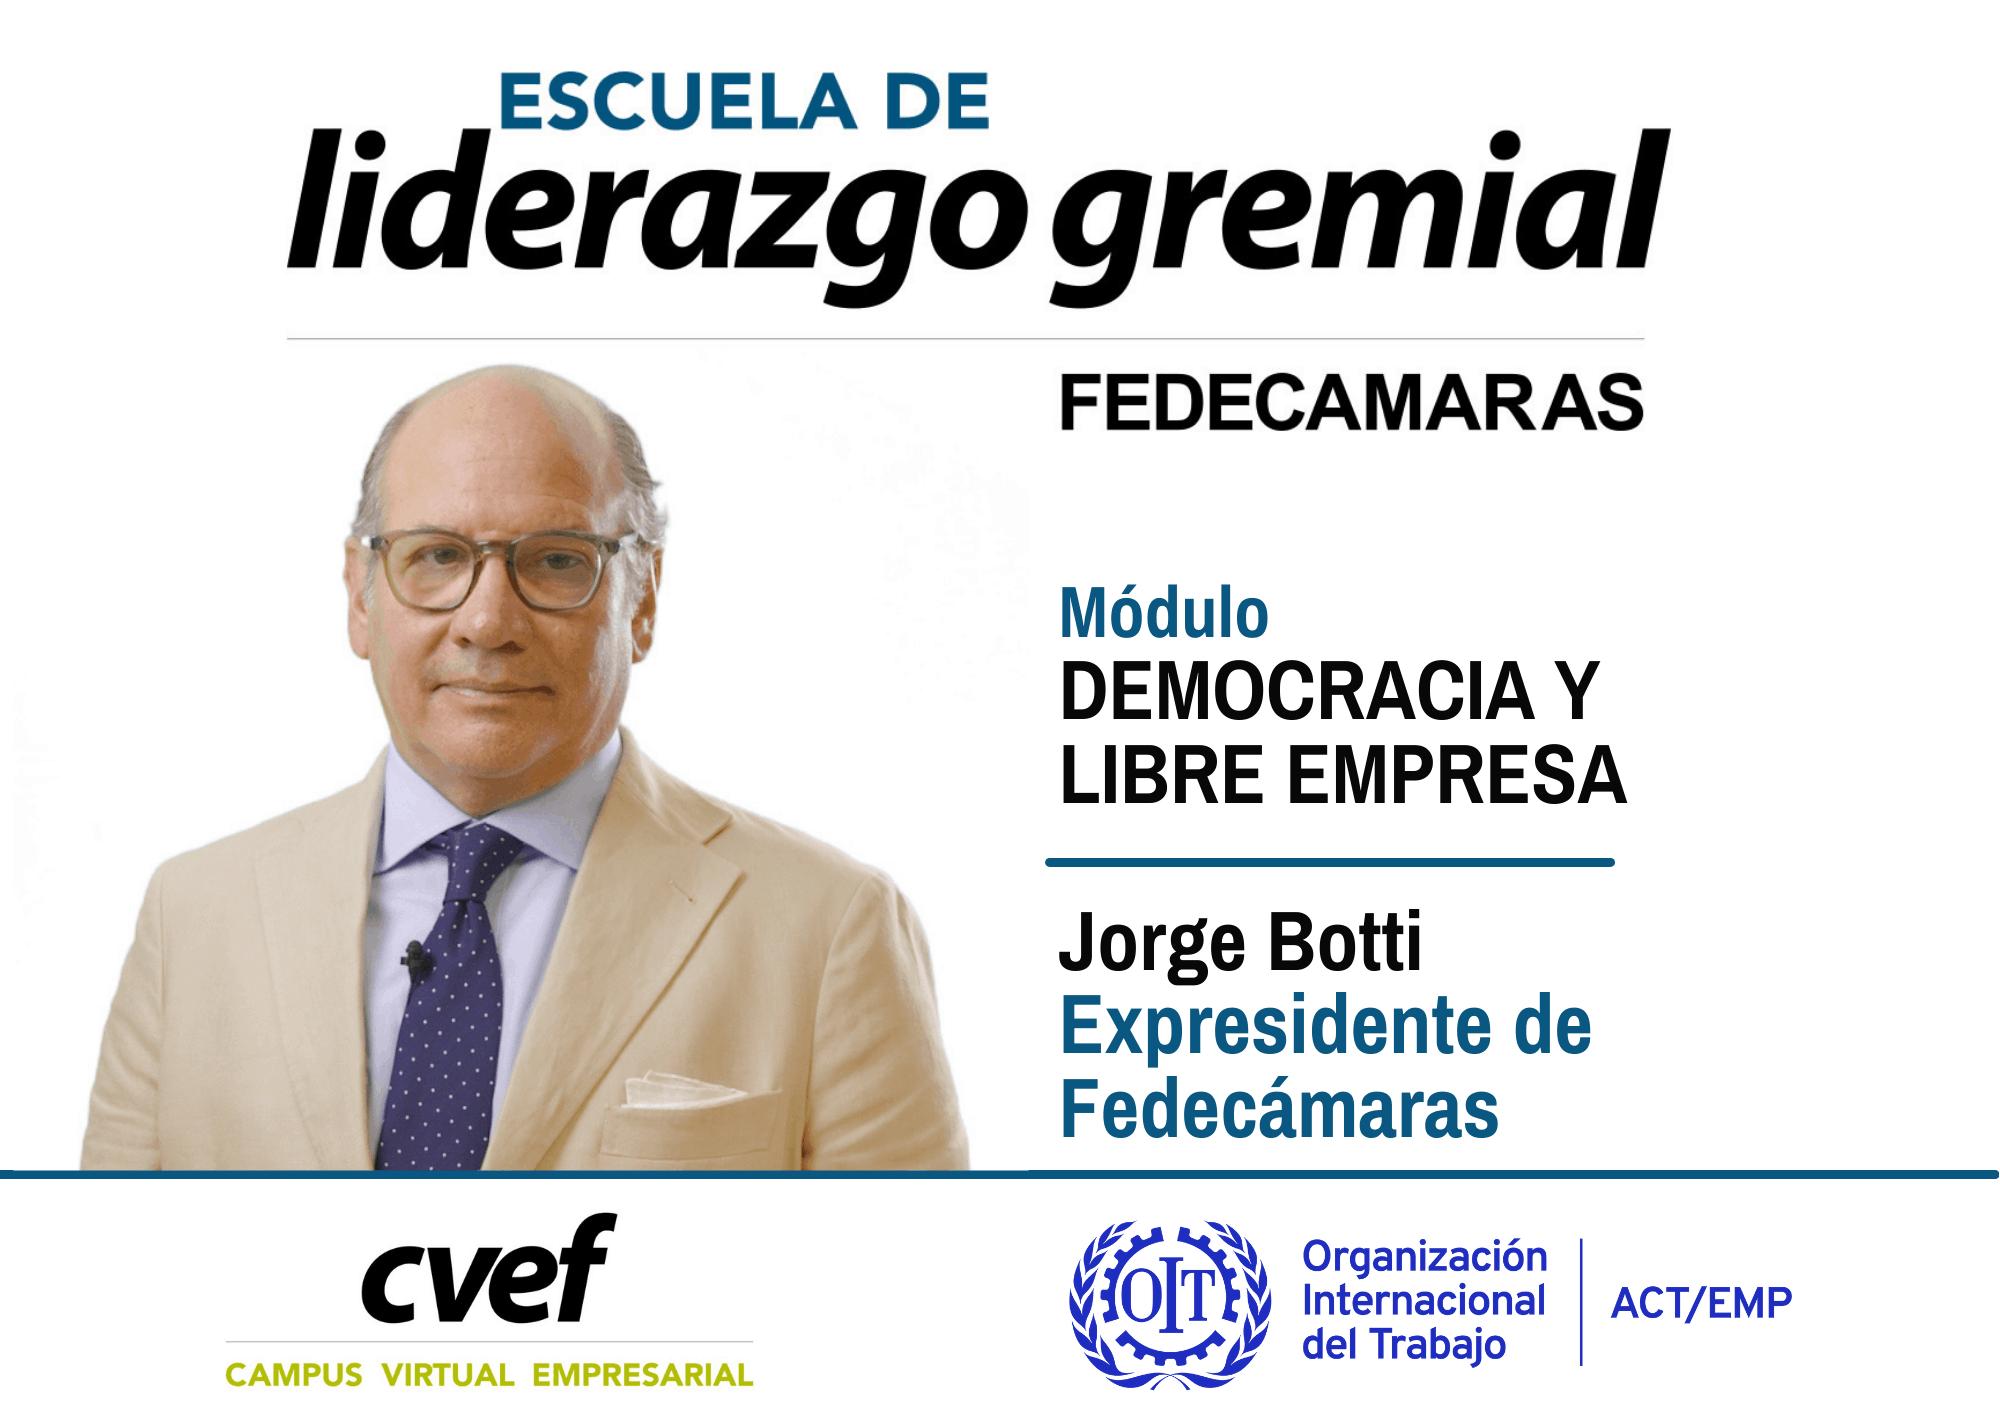 Escuela de Liderazgo Gremial. Jorge Botti